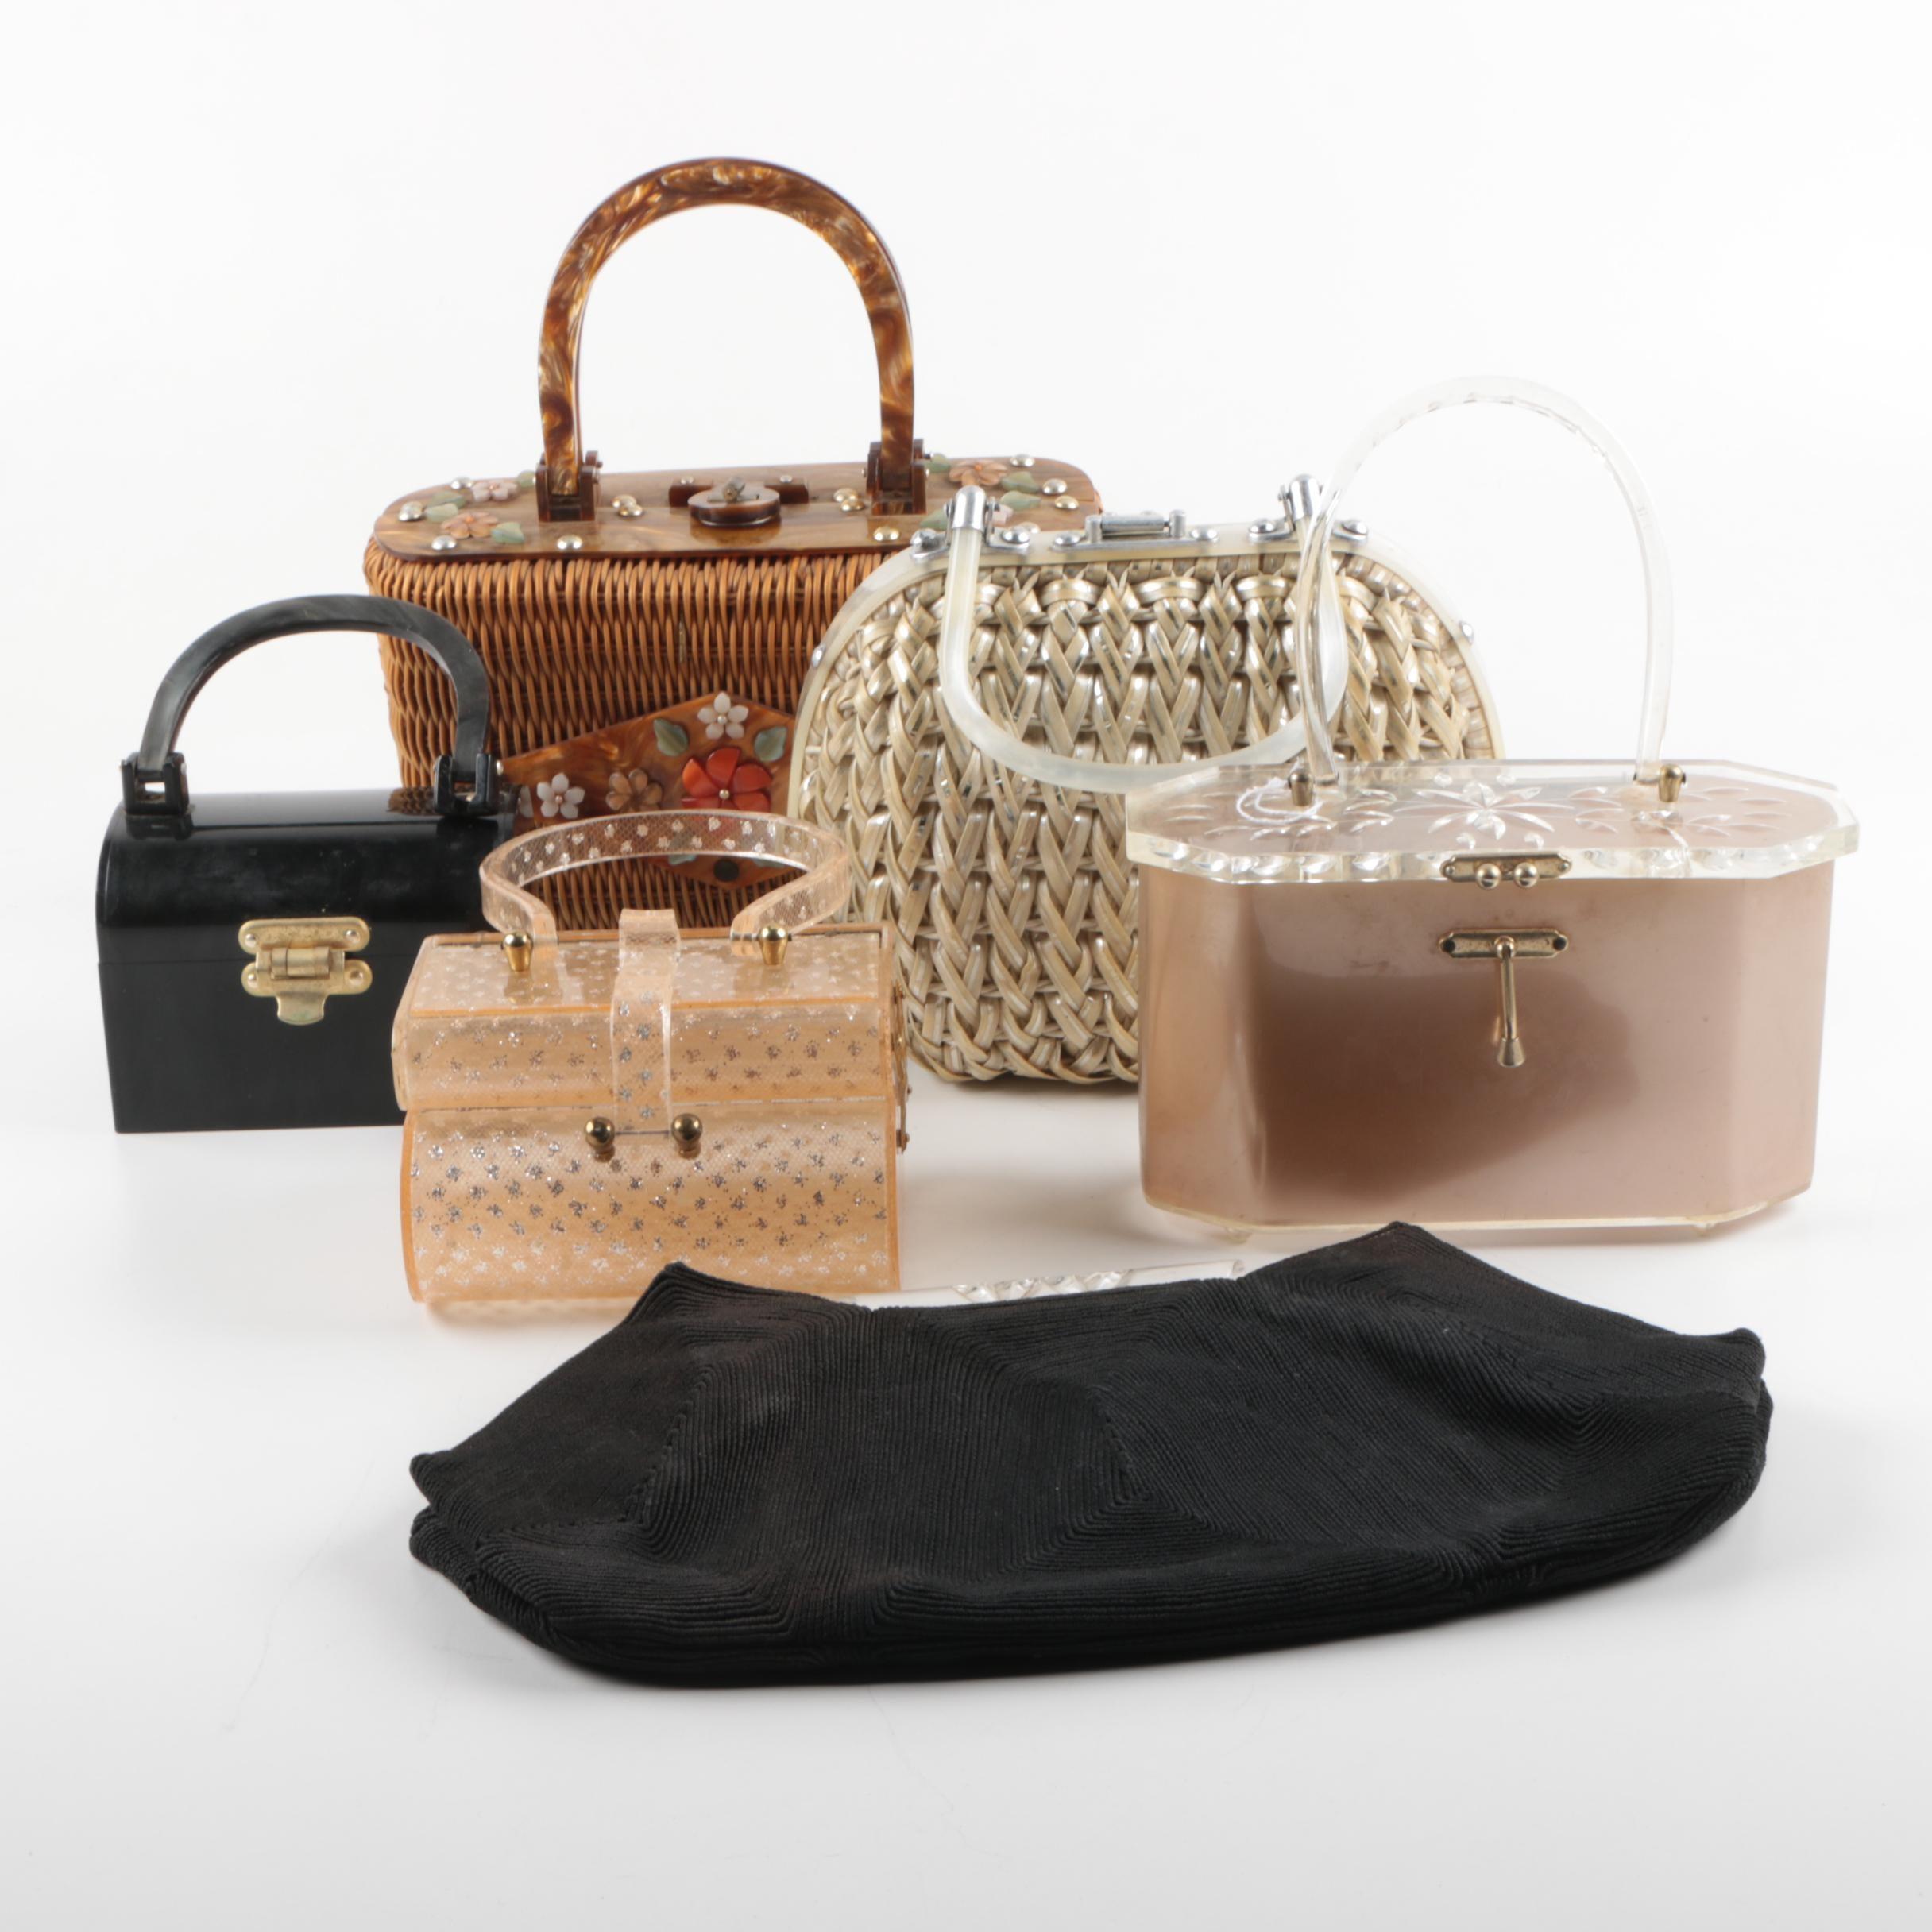 Vintage Acrylic and Fabric Handbags